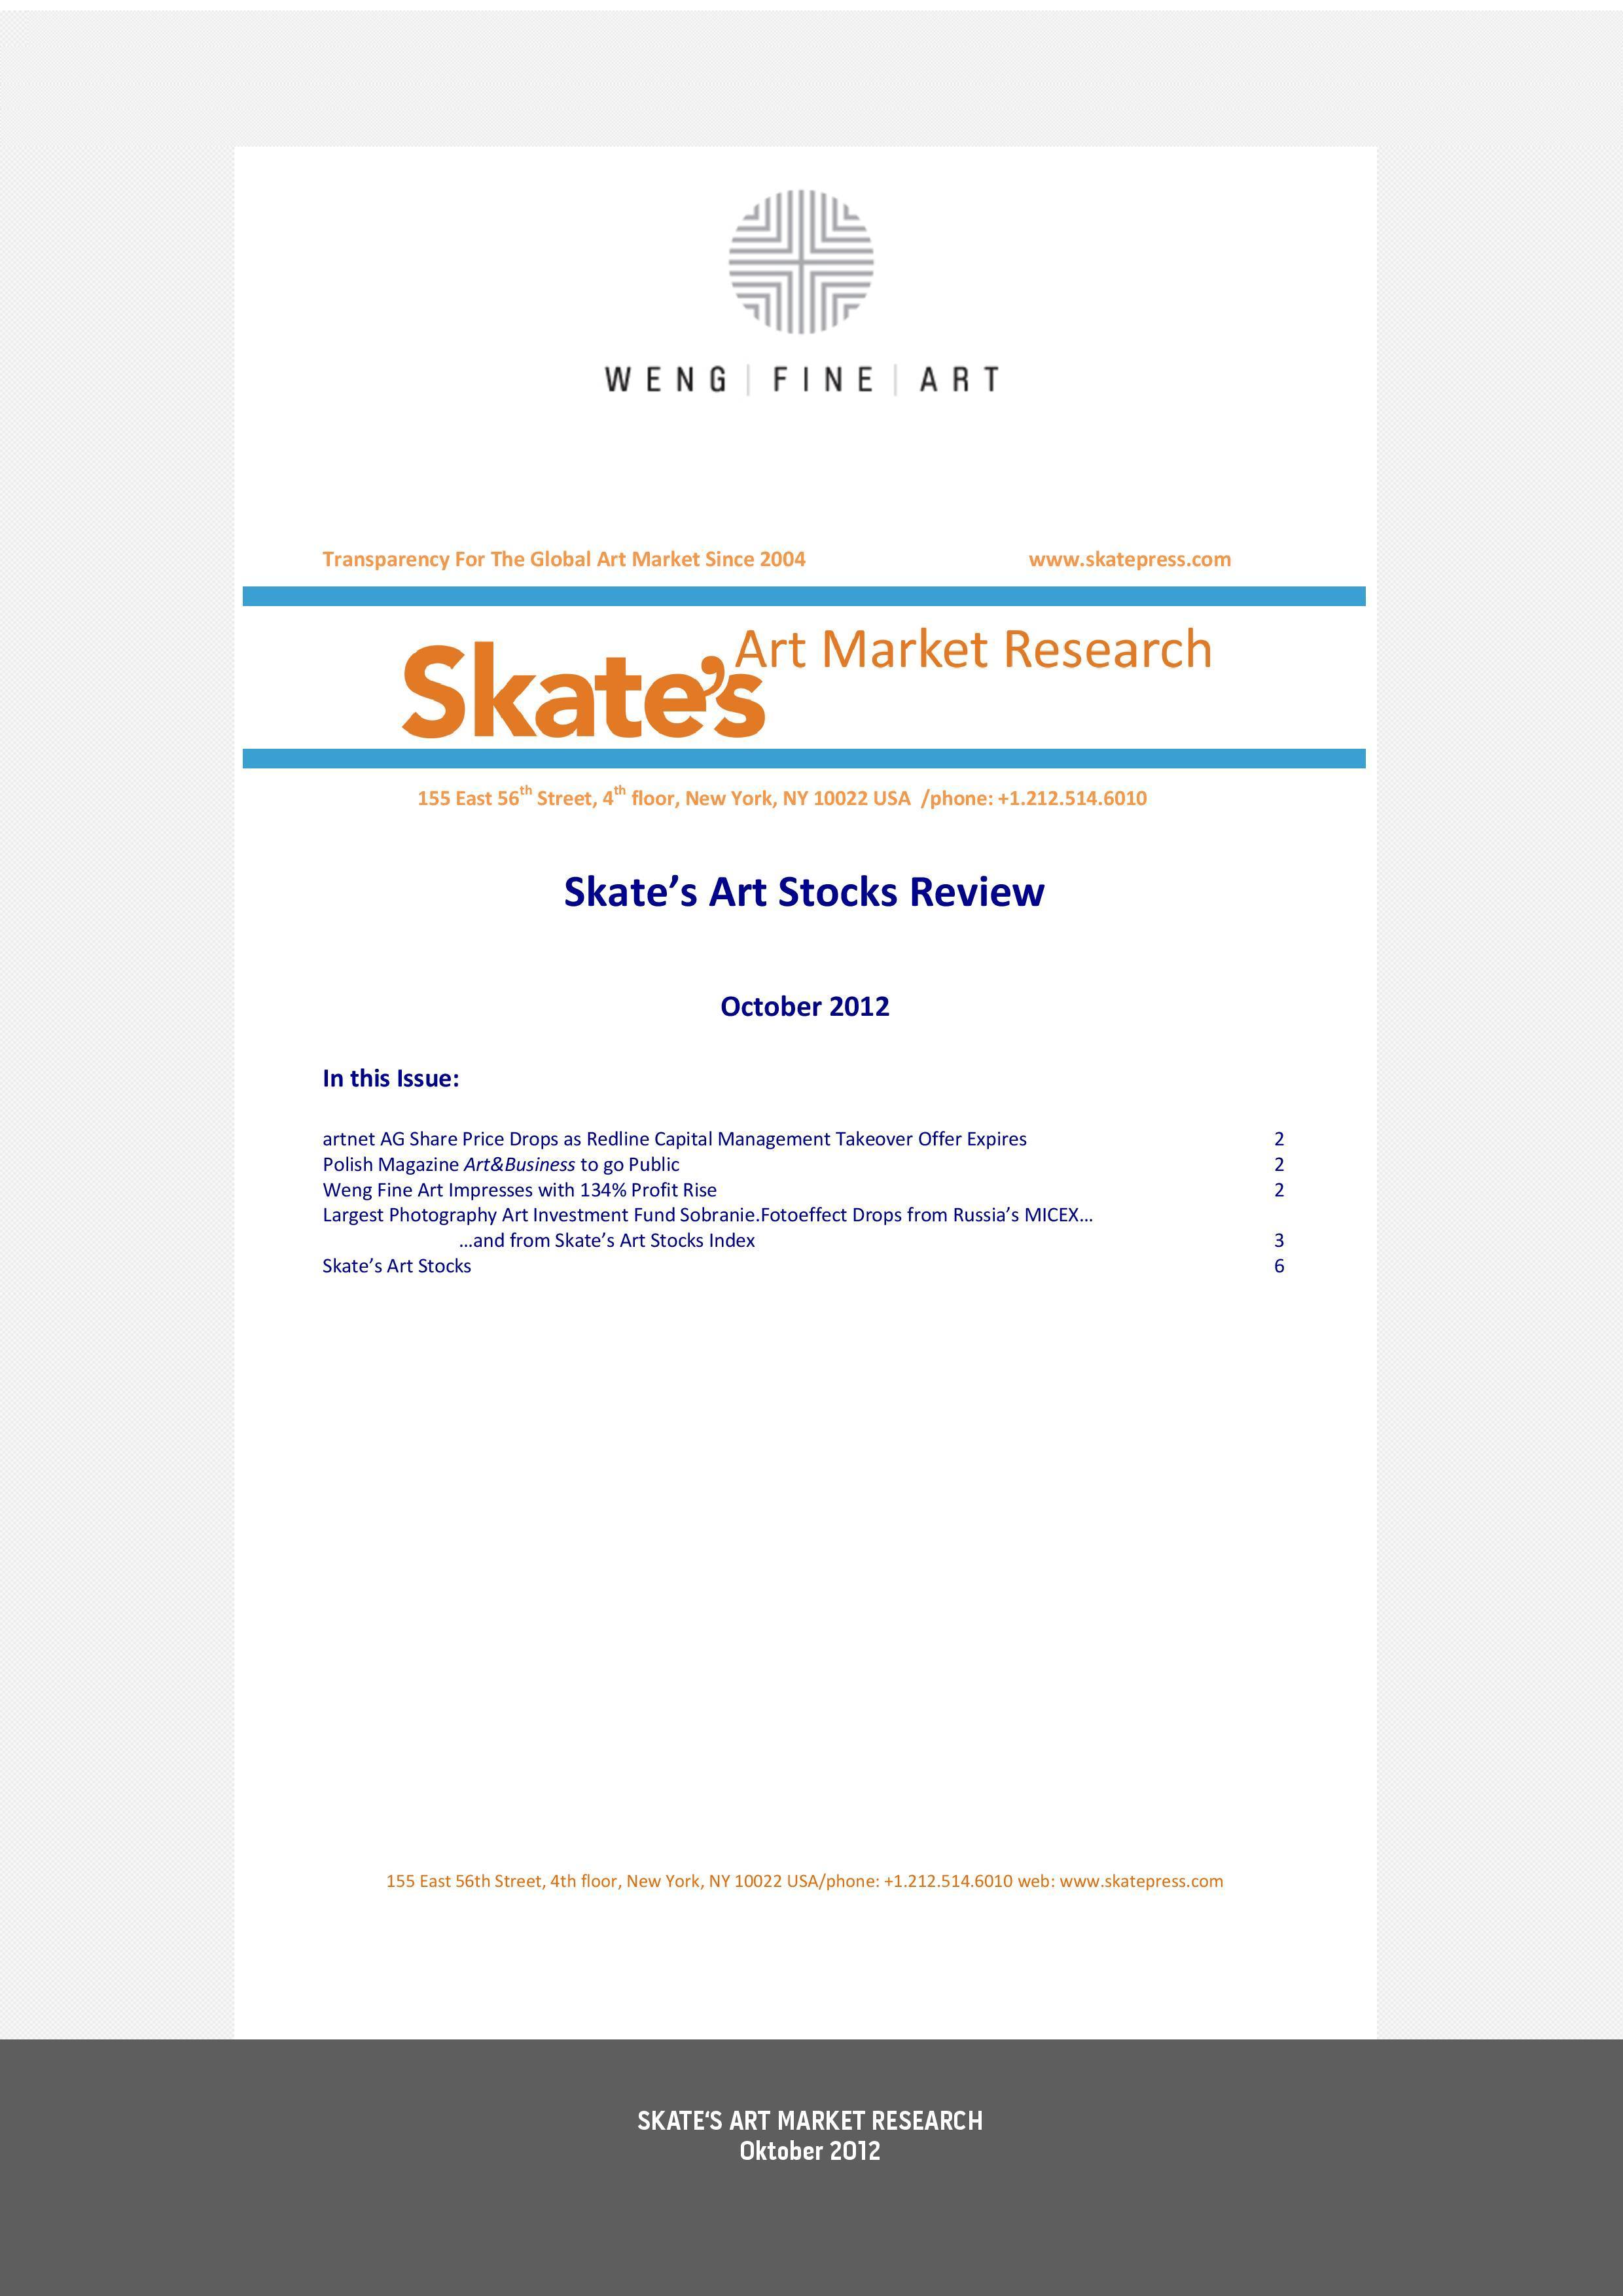 01.10.2012_Skates-page-001.jpg#asset:3515